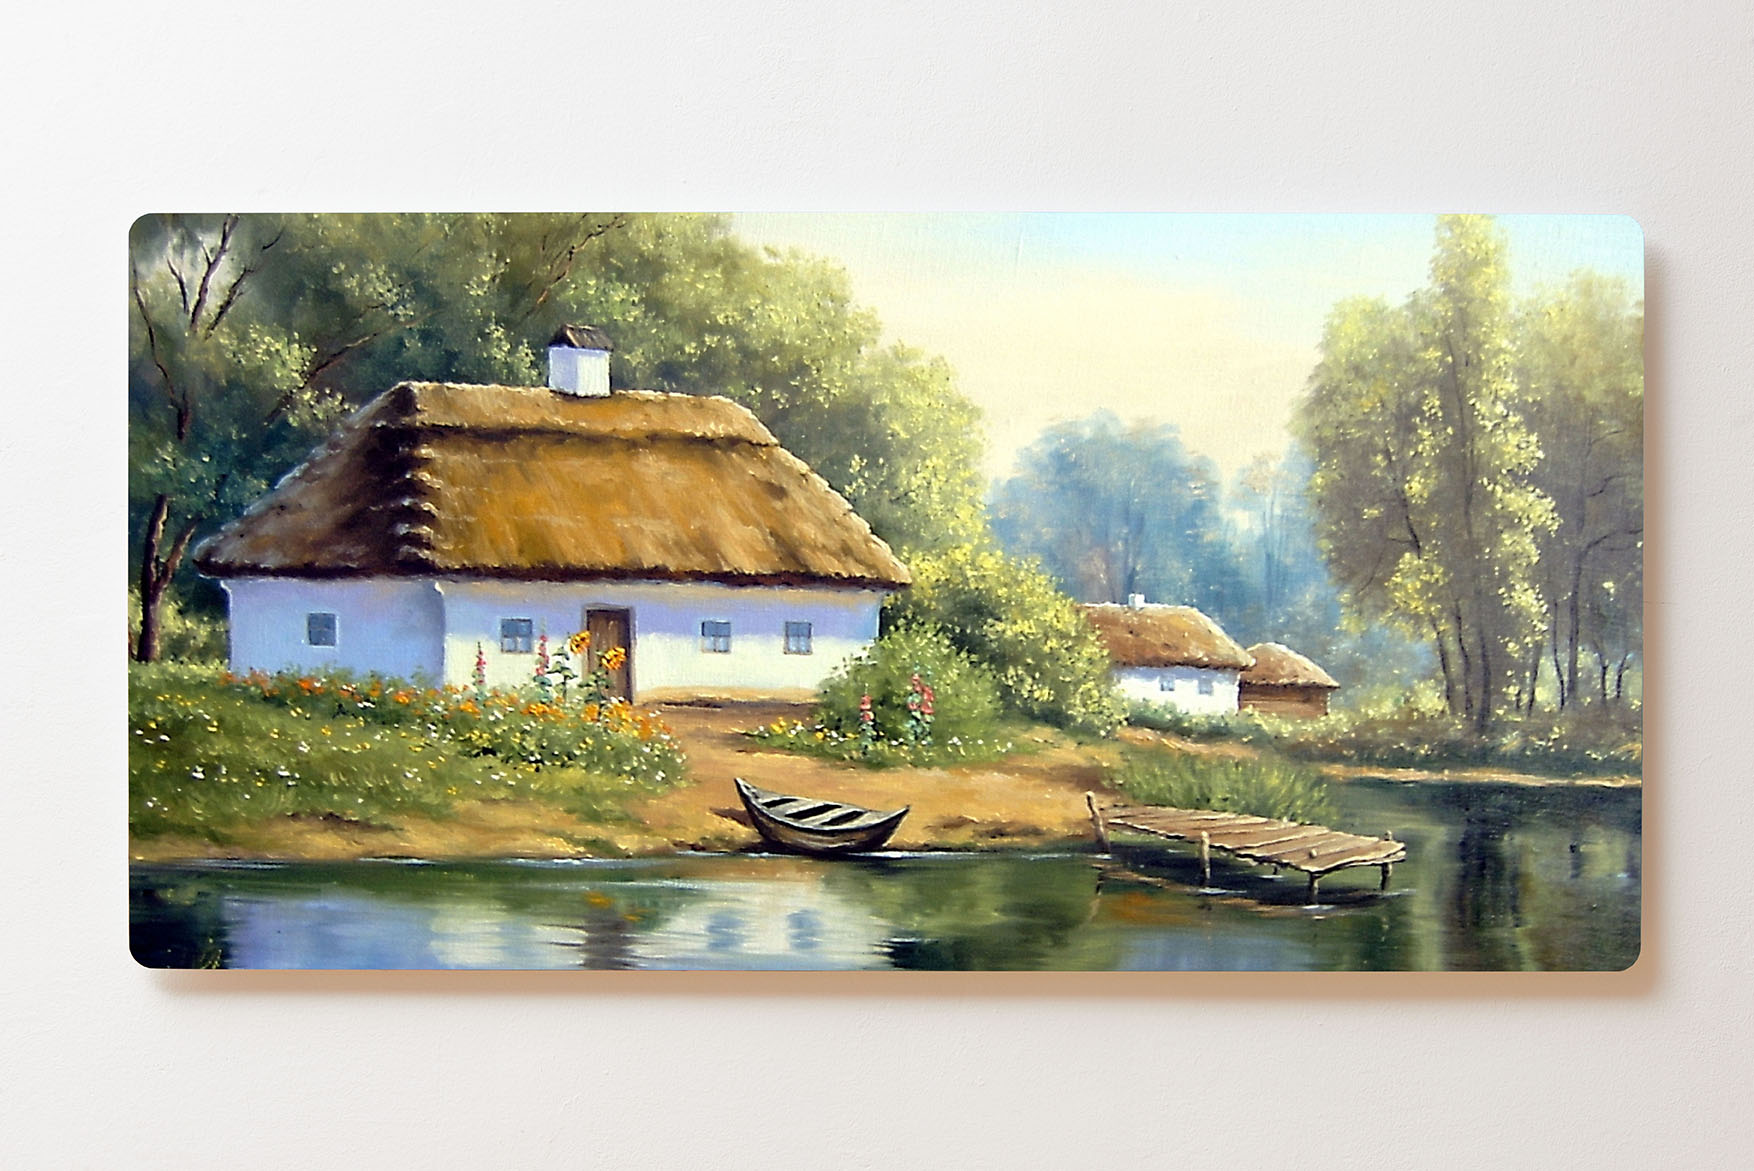 Magnettafel BACKLIGHT 120x60cm Motiv-Wandbild M160 Gemälde Landhaus